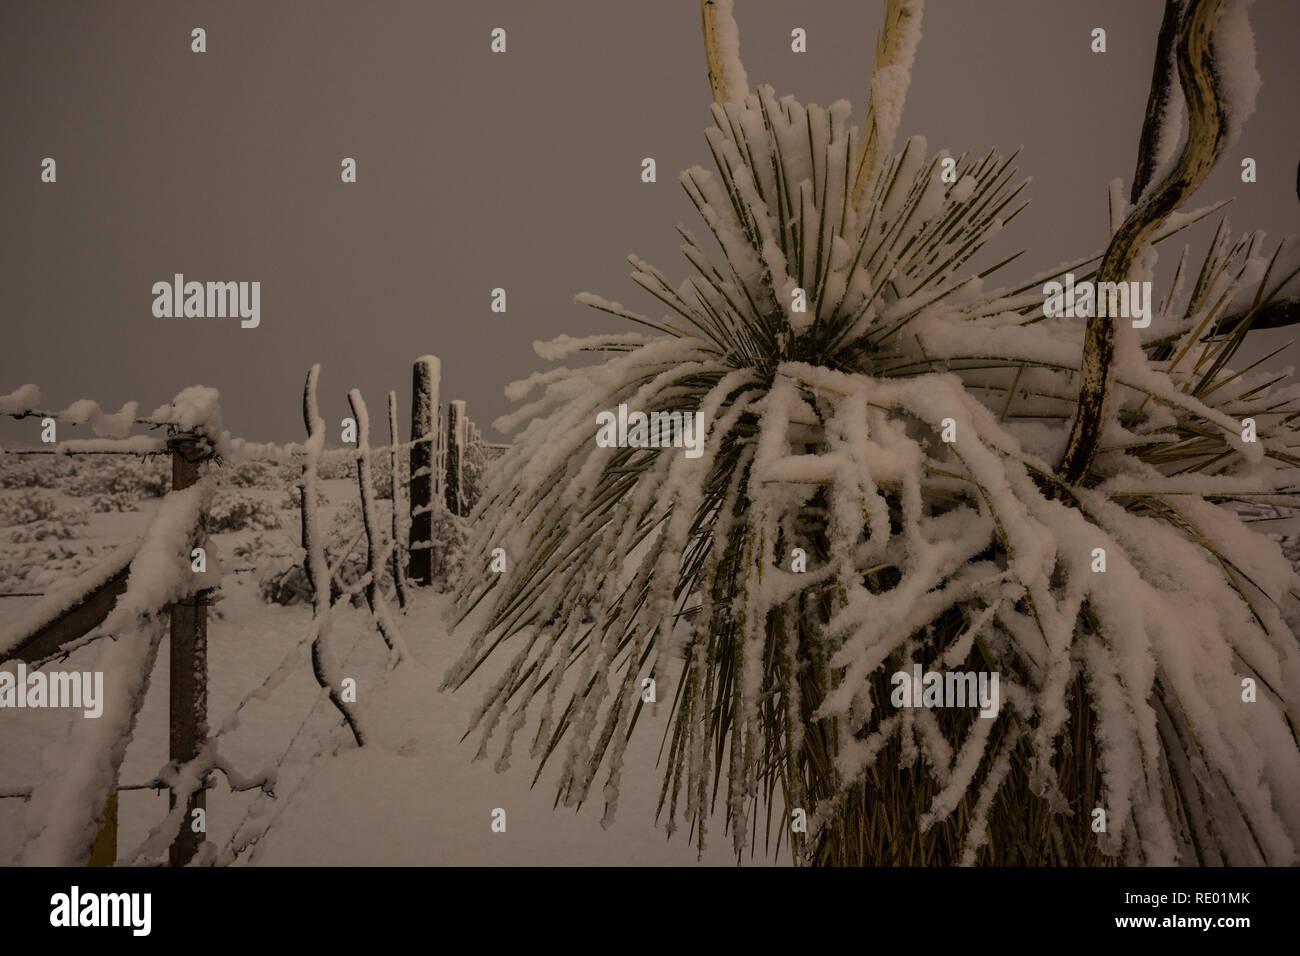 Lordsburg, Hidalgo County, New Mexico, USA - Stock Image